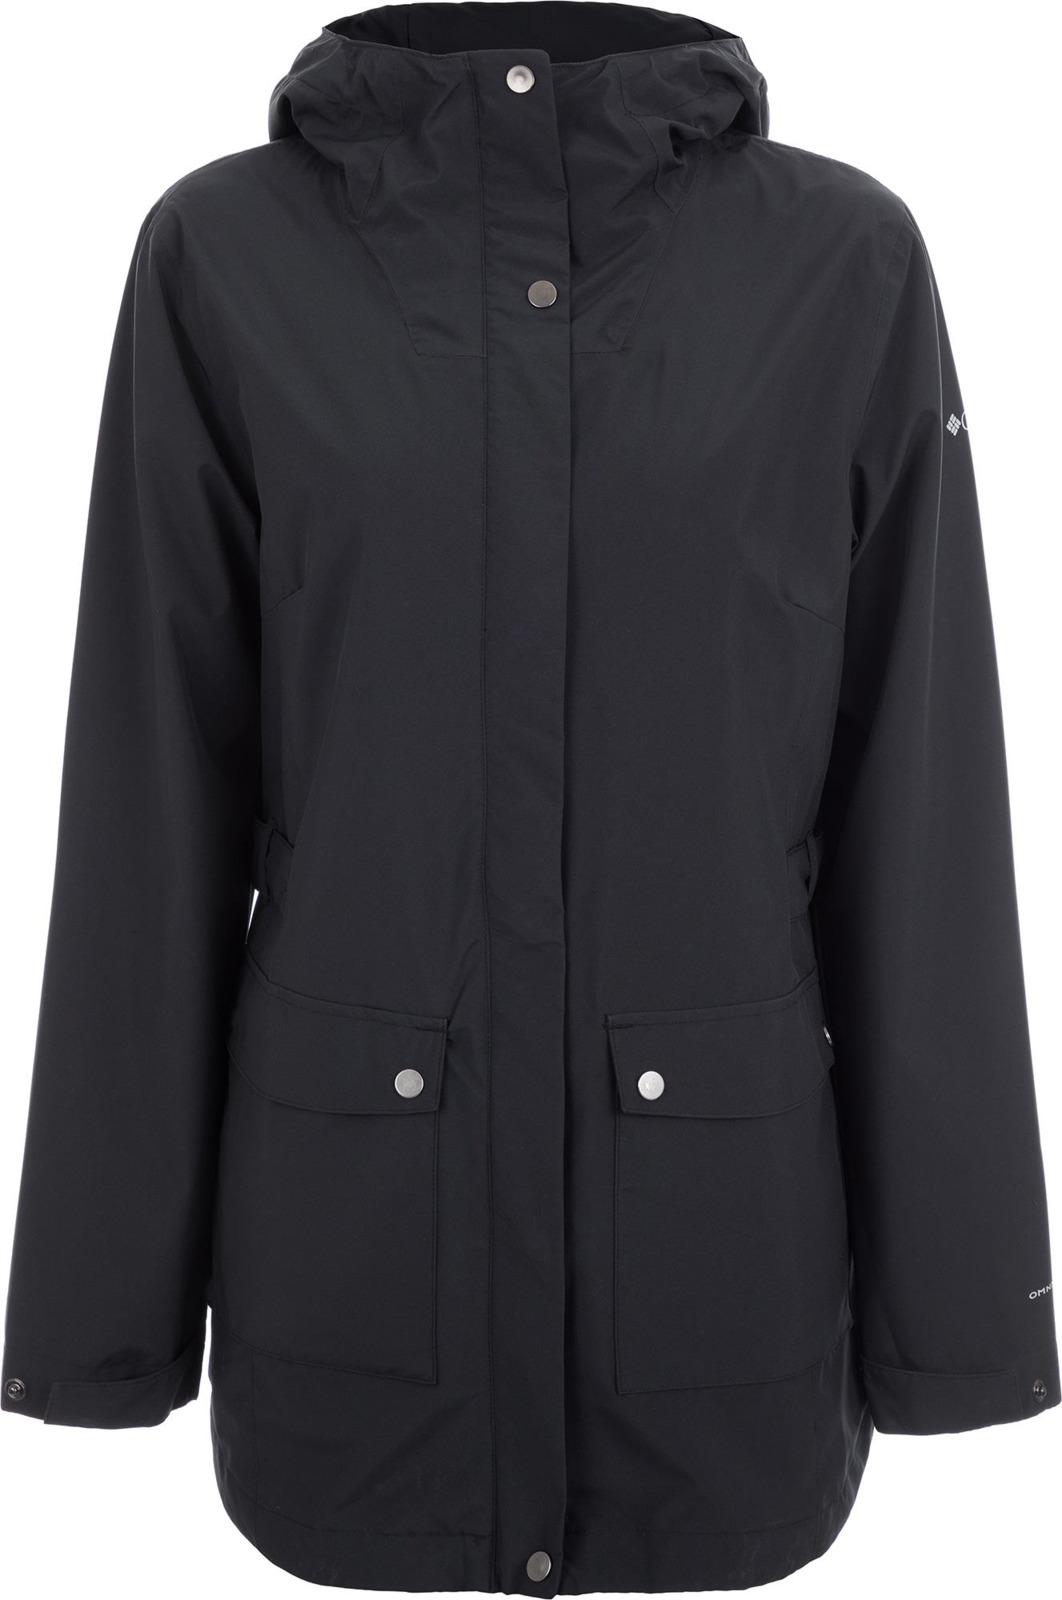 Ветровка Columbia Here And There Trench Jacket плащ женский columbia pardon my trench rain jacket цвет серый 1839841 027 размер xs 42